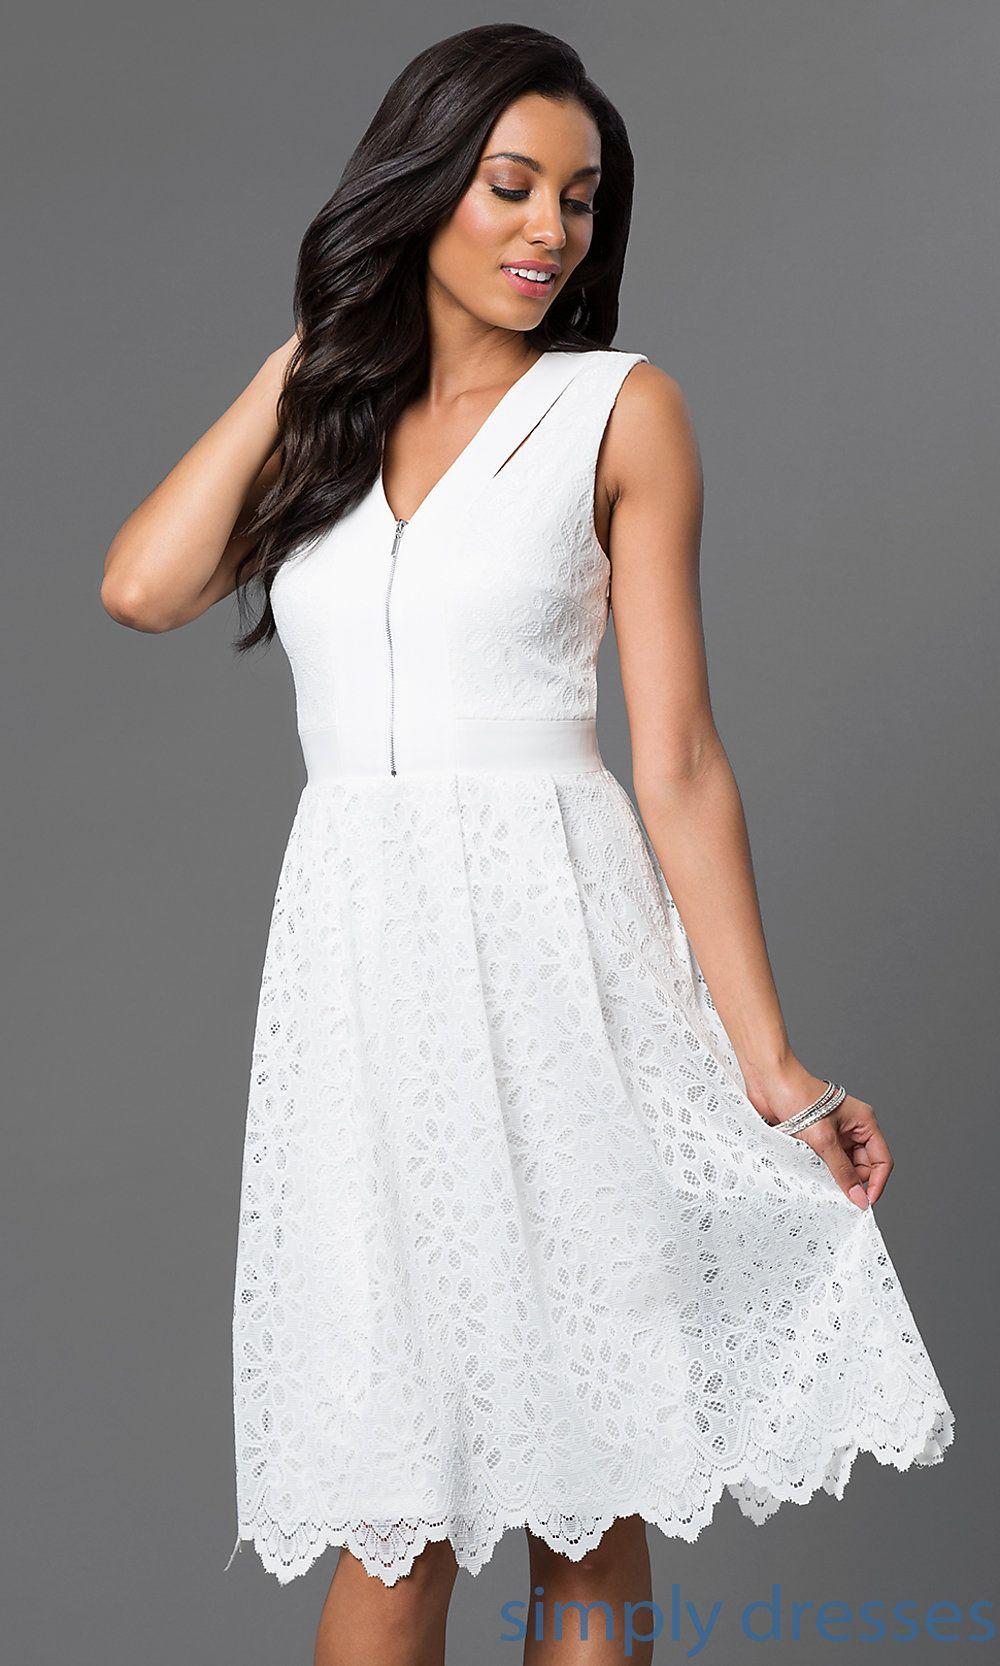 Dresses Formal Prom Dresses Evening Wear Sg Asakw1aqa Dresses Short White Cocktail Dresses White Dresses Graduation [ 1666 x 1000 Pixel ]